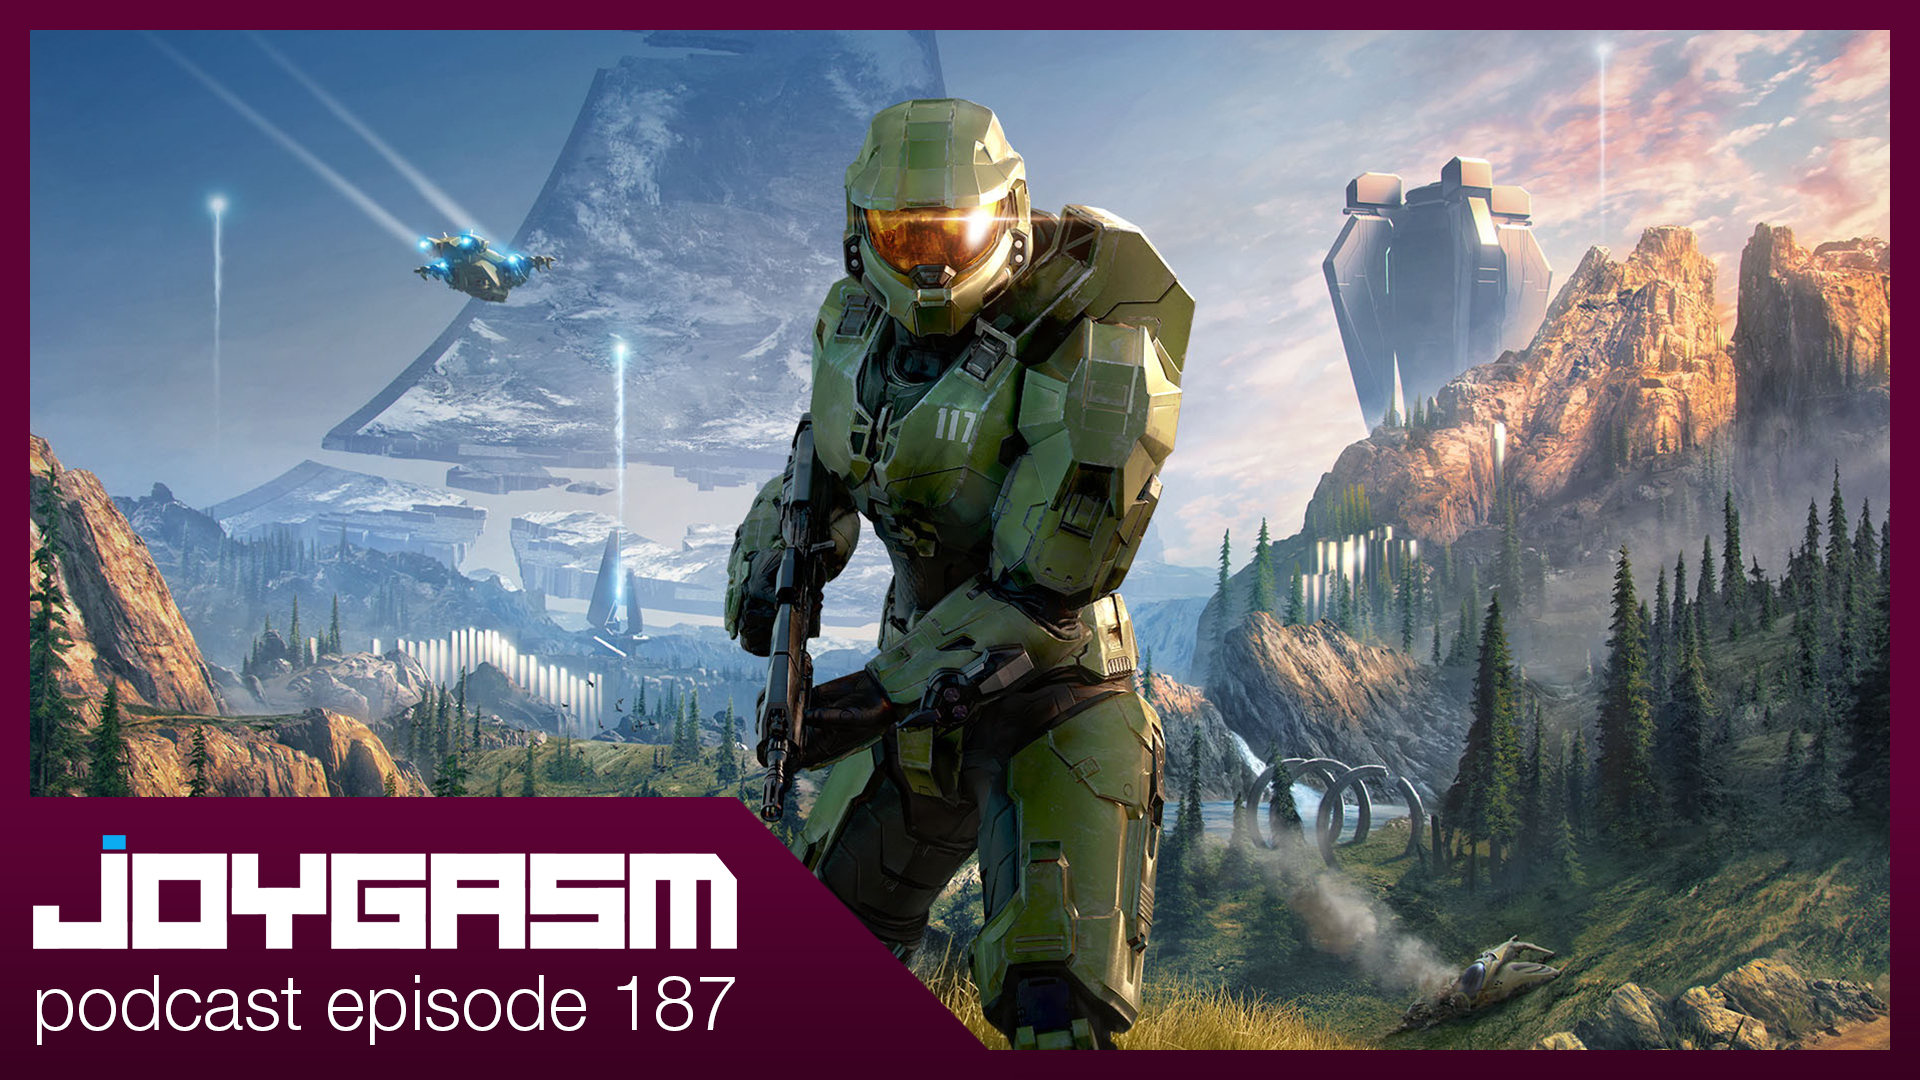 Ep. 187: Halo Infinite Delayed, DC Fandome, & Dark Myth Wukong Game